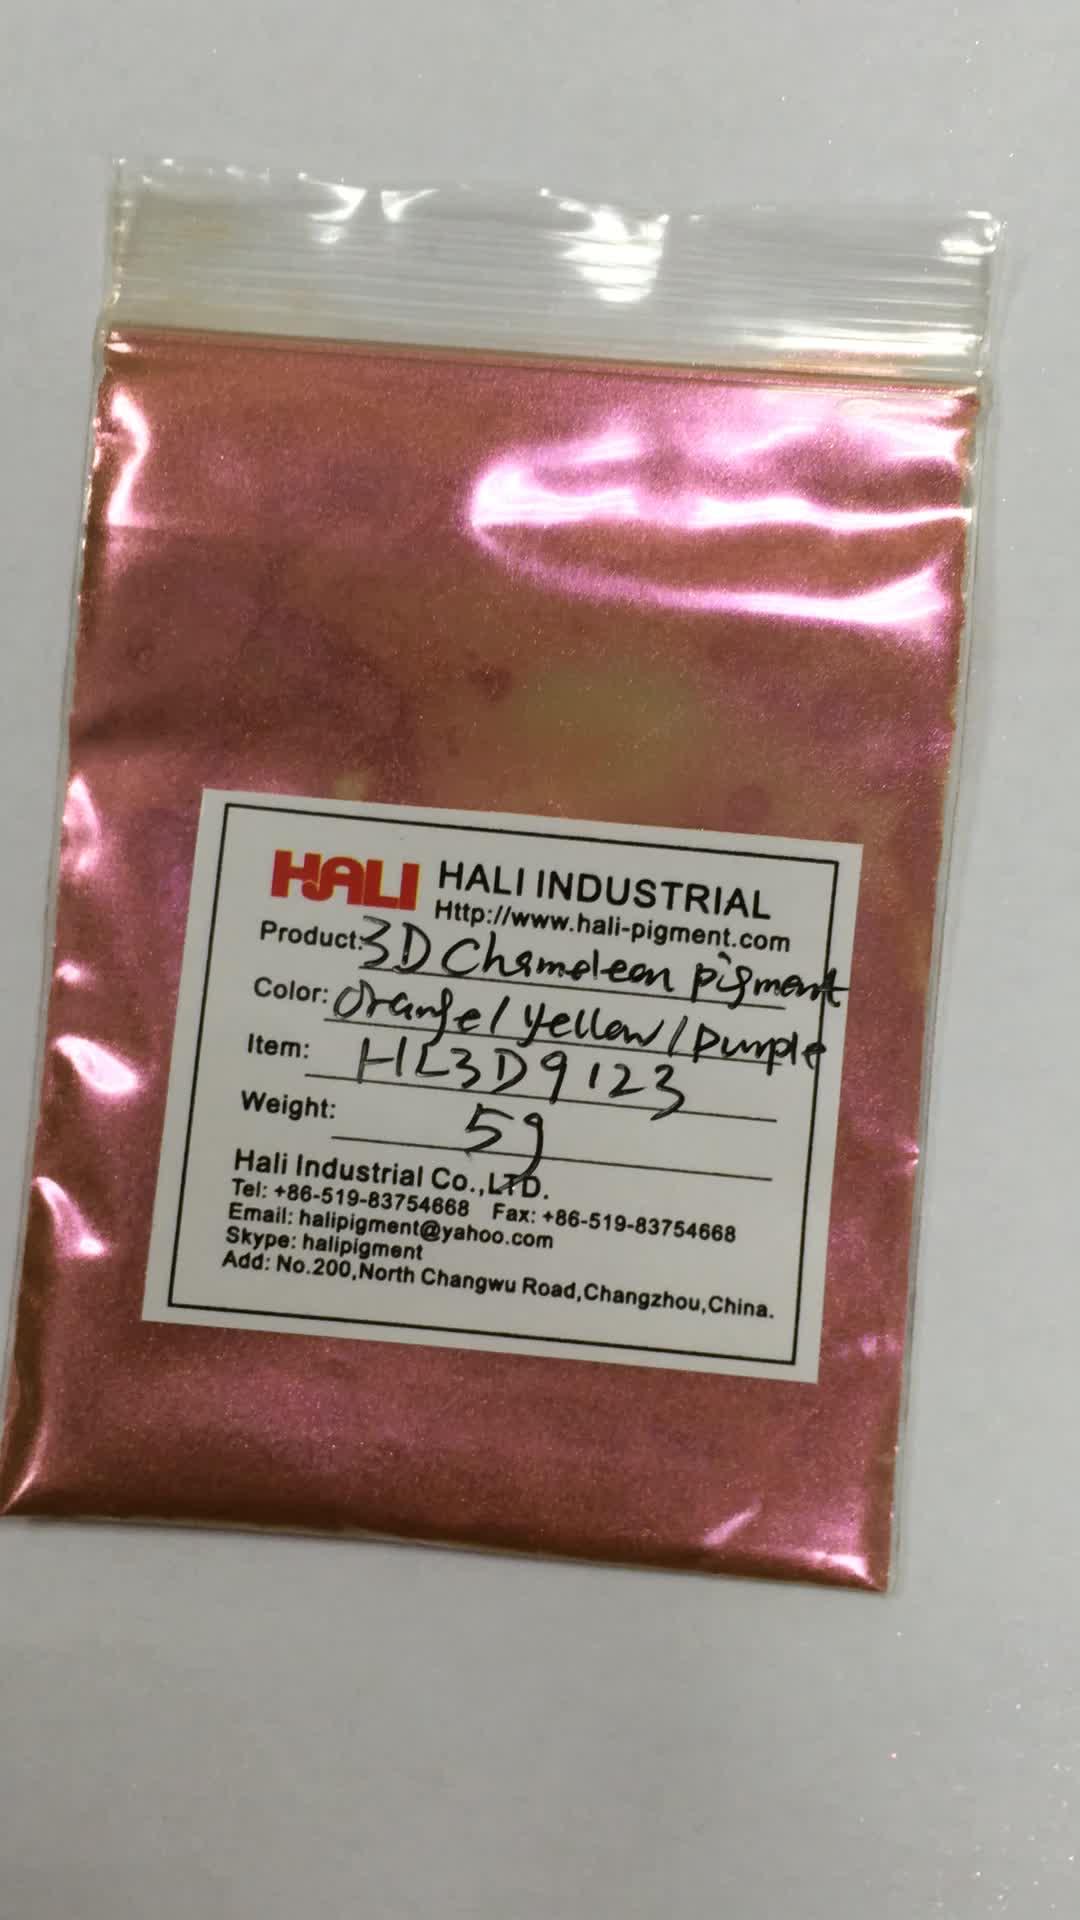 3D chameleon magnetic pigment,three-dimensional powder,item:HL3D9123,color:orange/yellow/purple